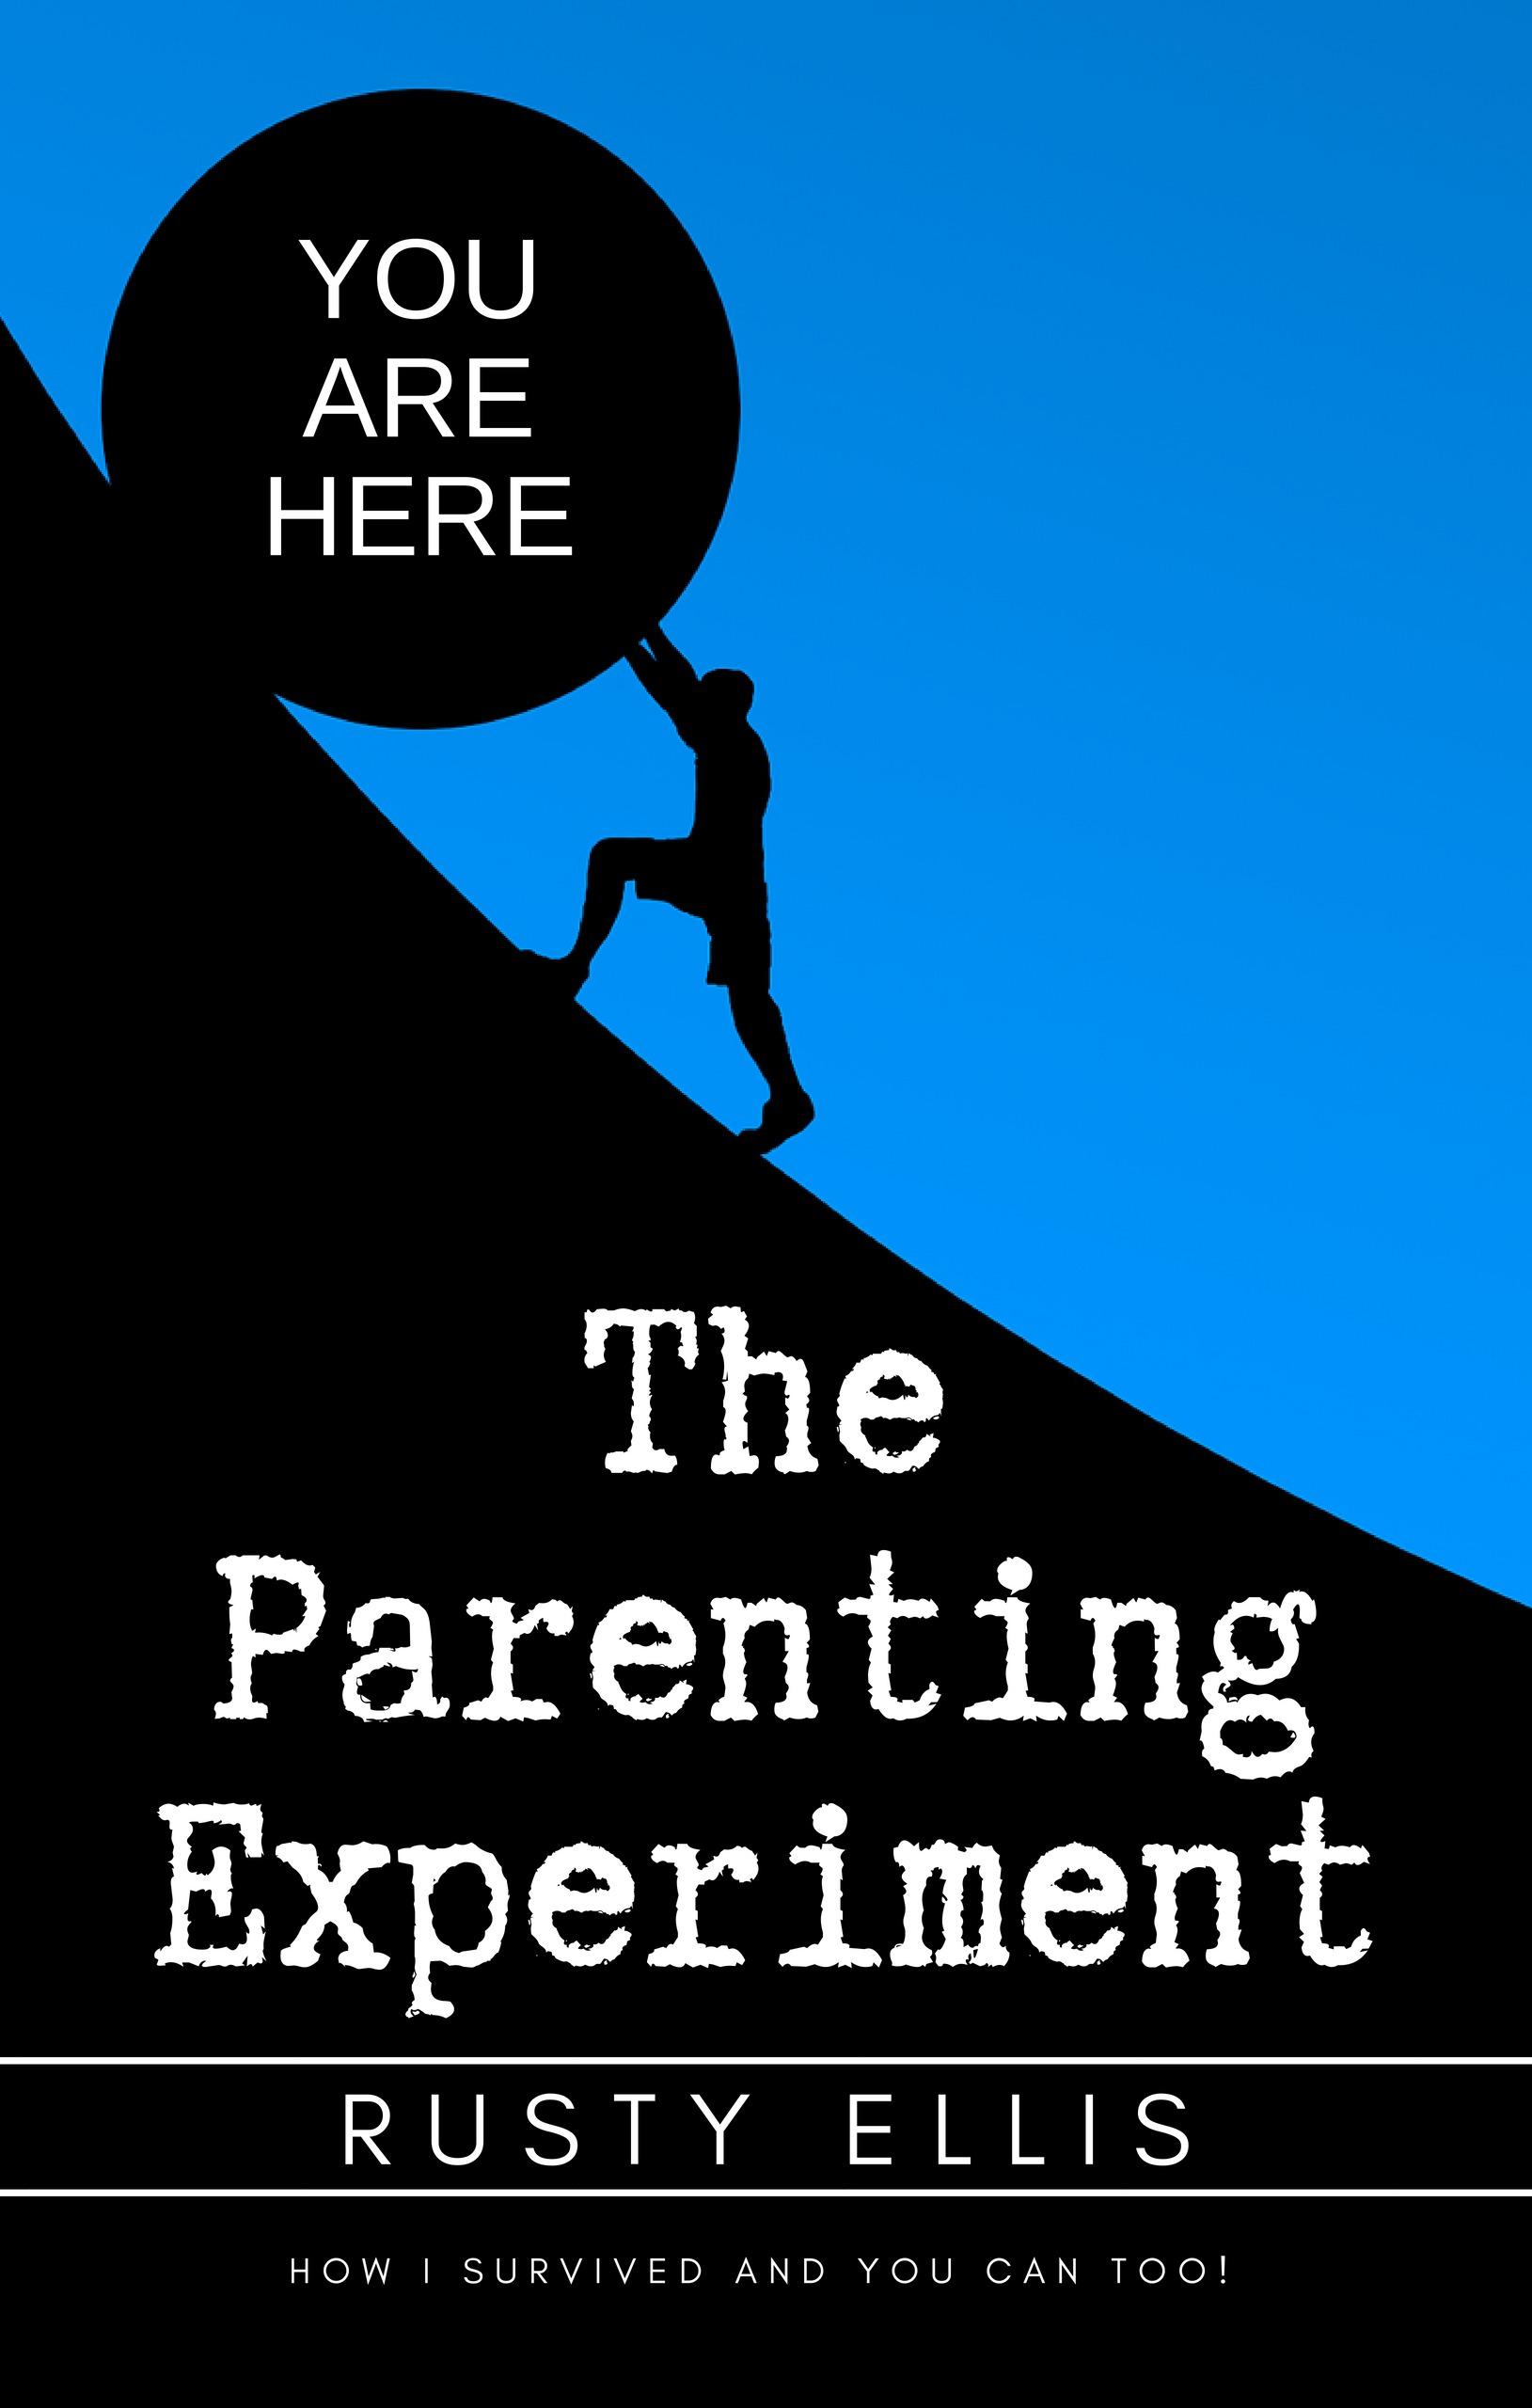 Rusty Ellis - The Parenting Experiment